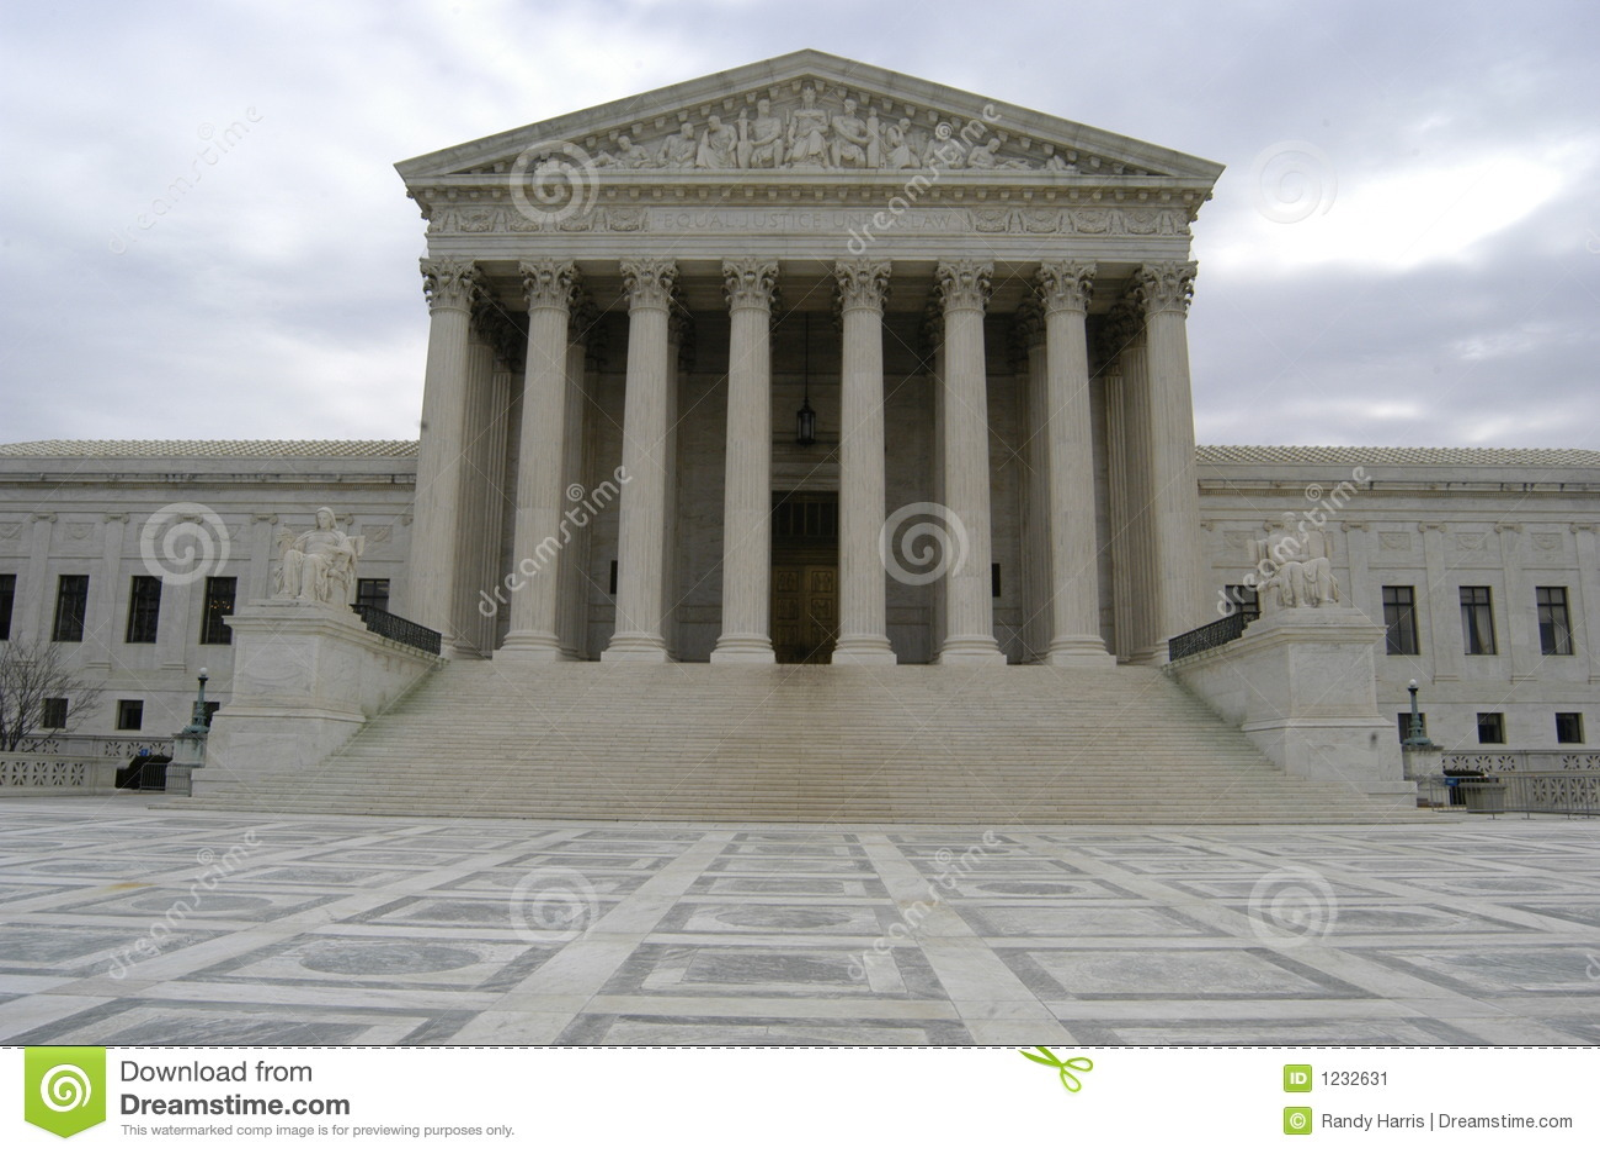 Edifício da corte suprema